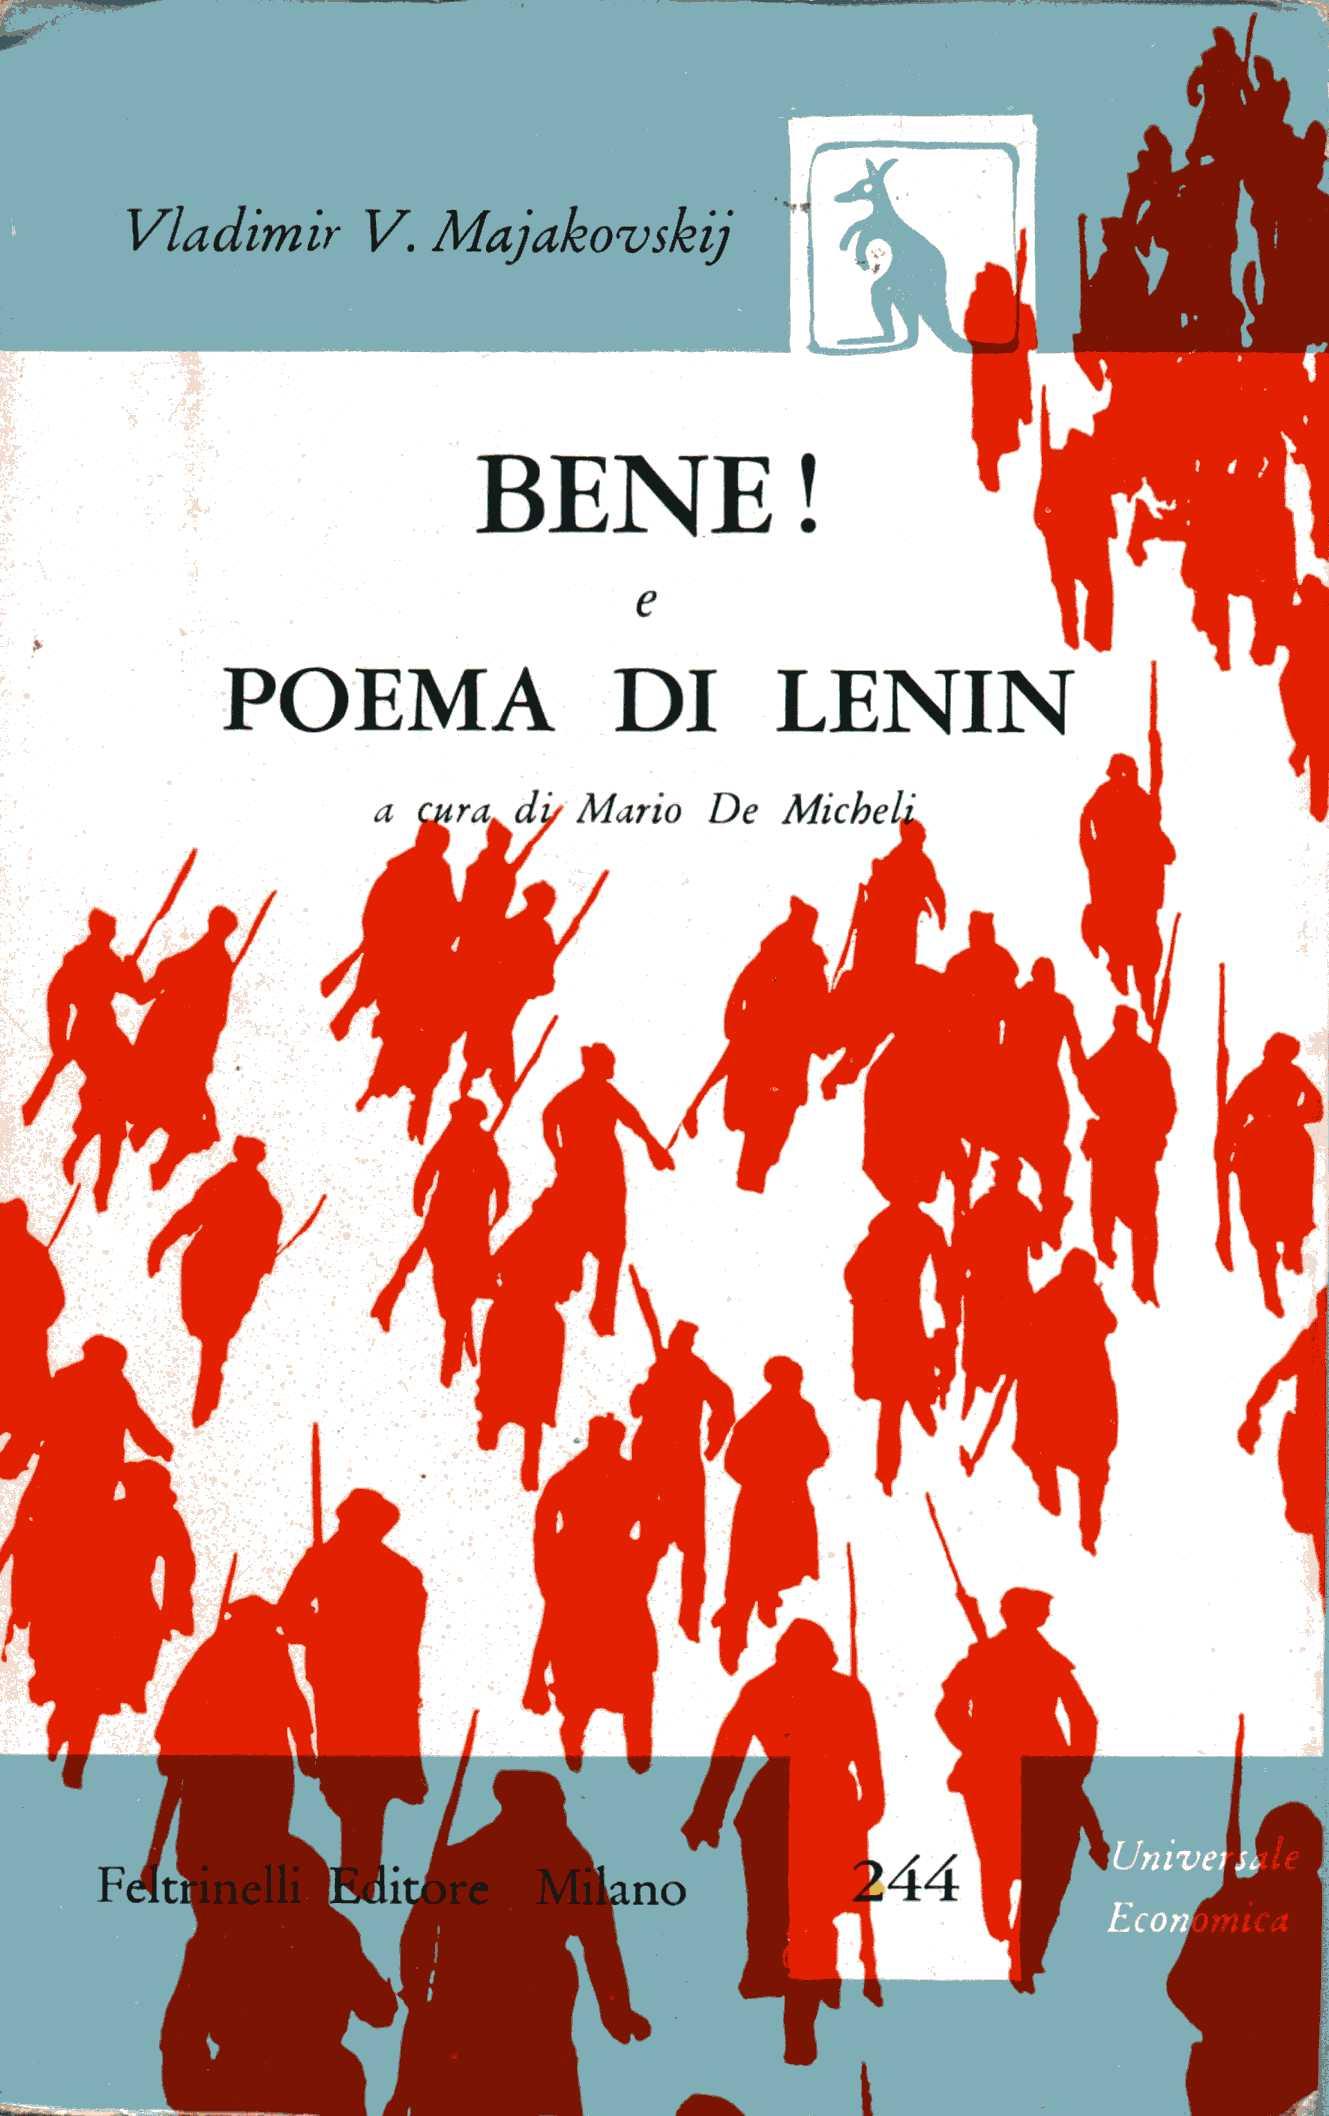 Bene! - Poema di Lenin